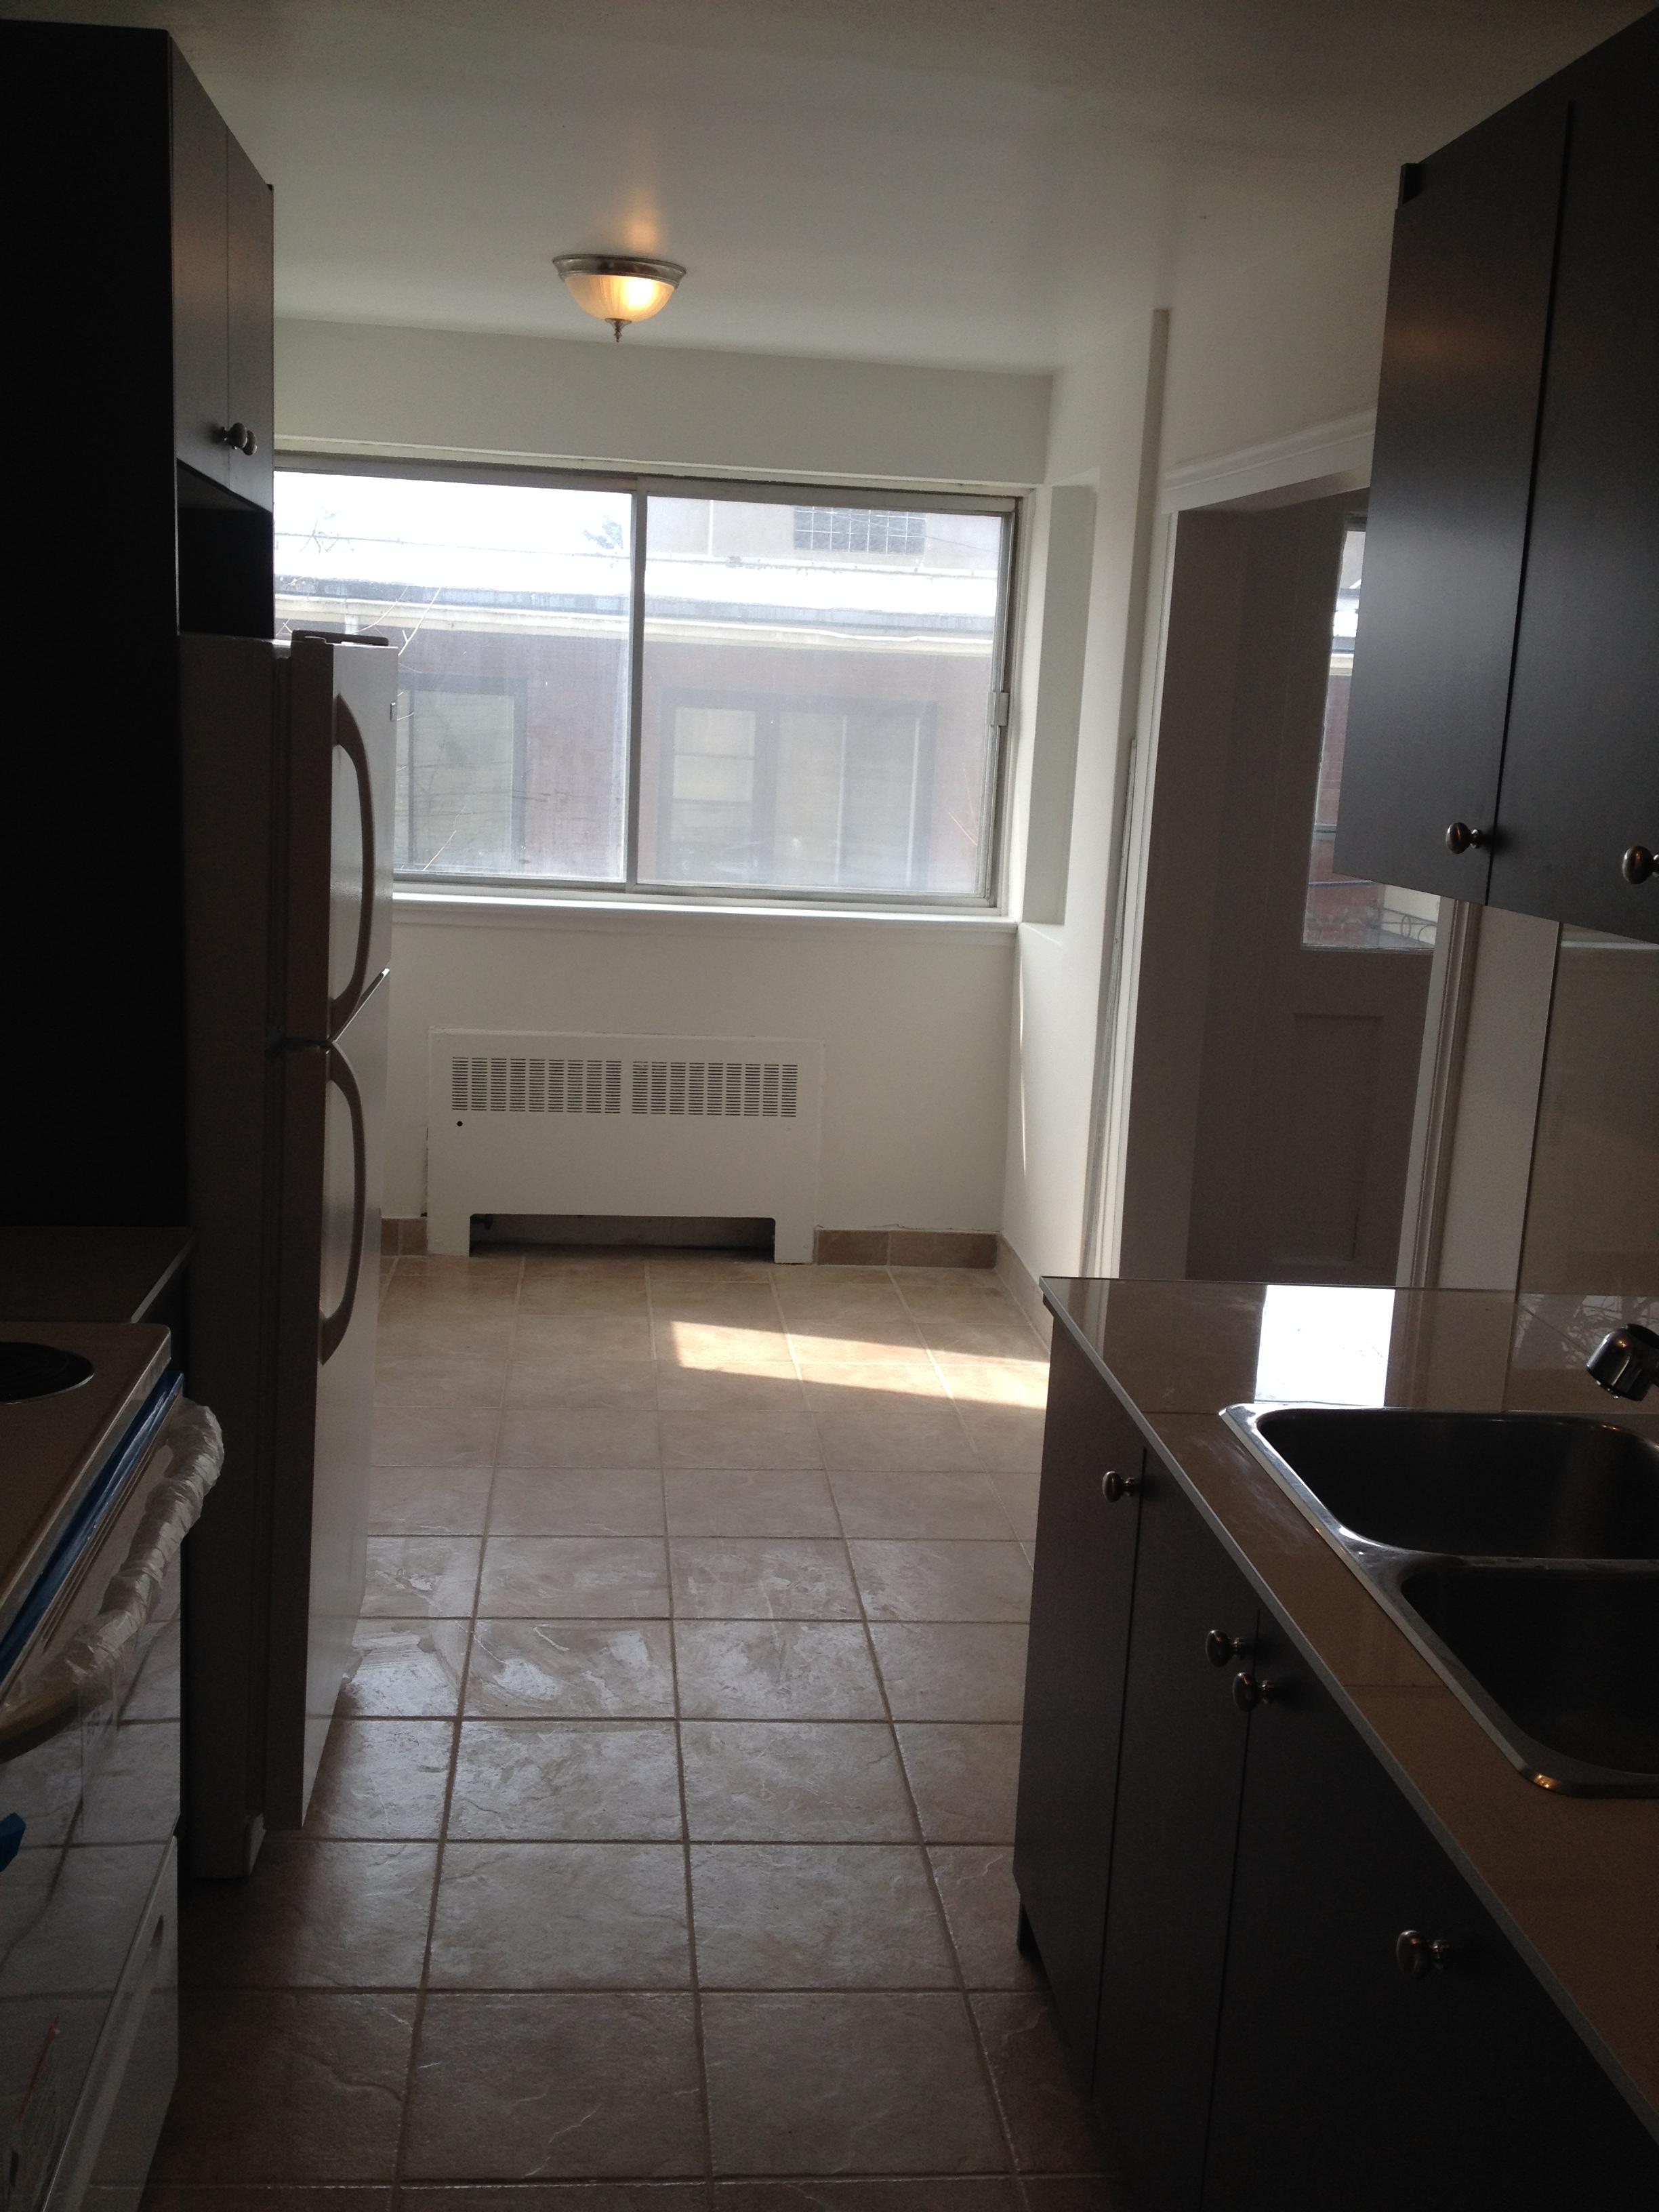 2 bedroom Apartments for rent in Cote-des-Neiges at 2615-2625 Kent - Photo 05 - RentersPages – L20674